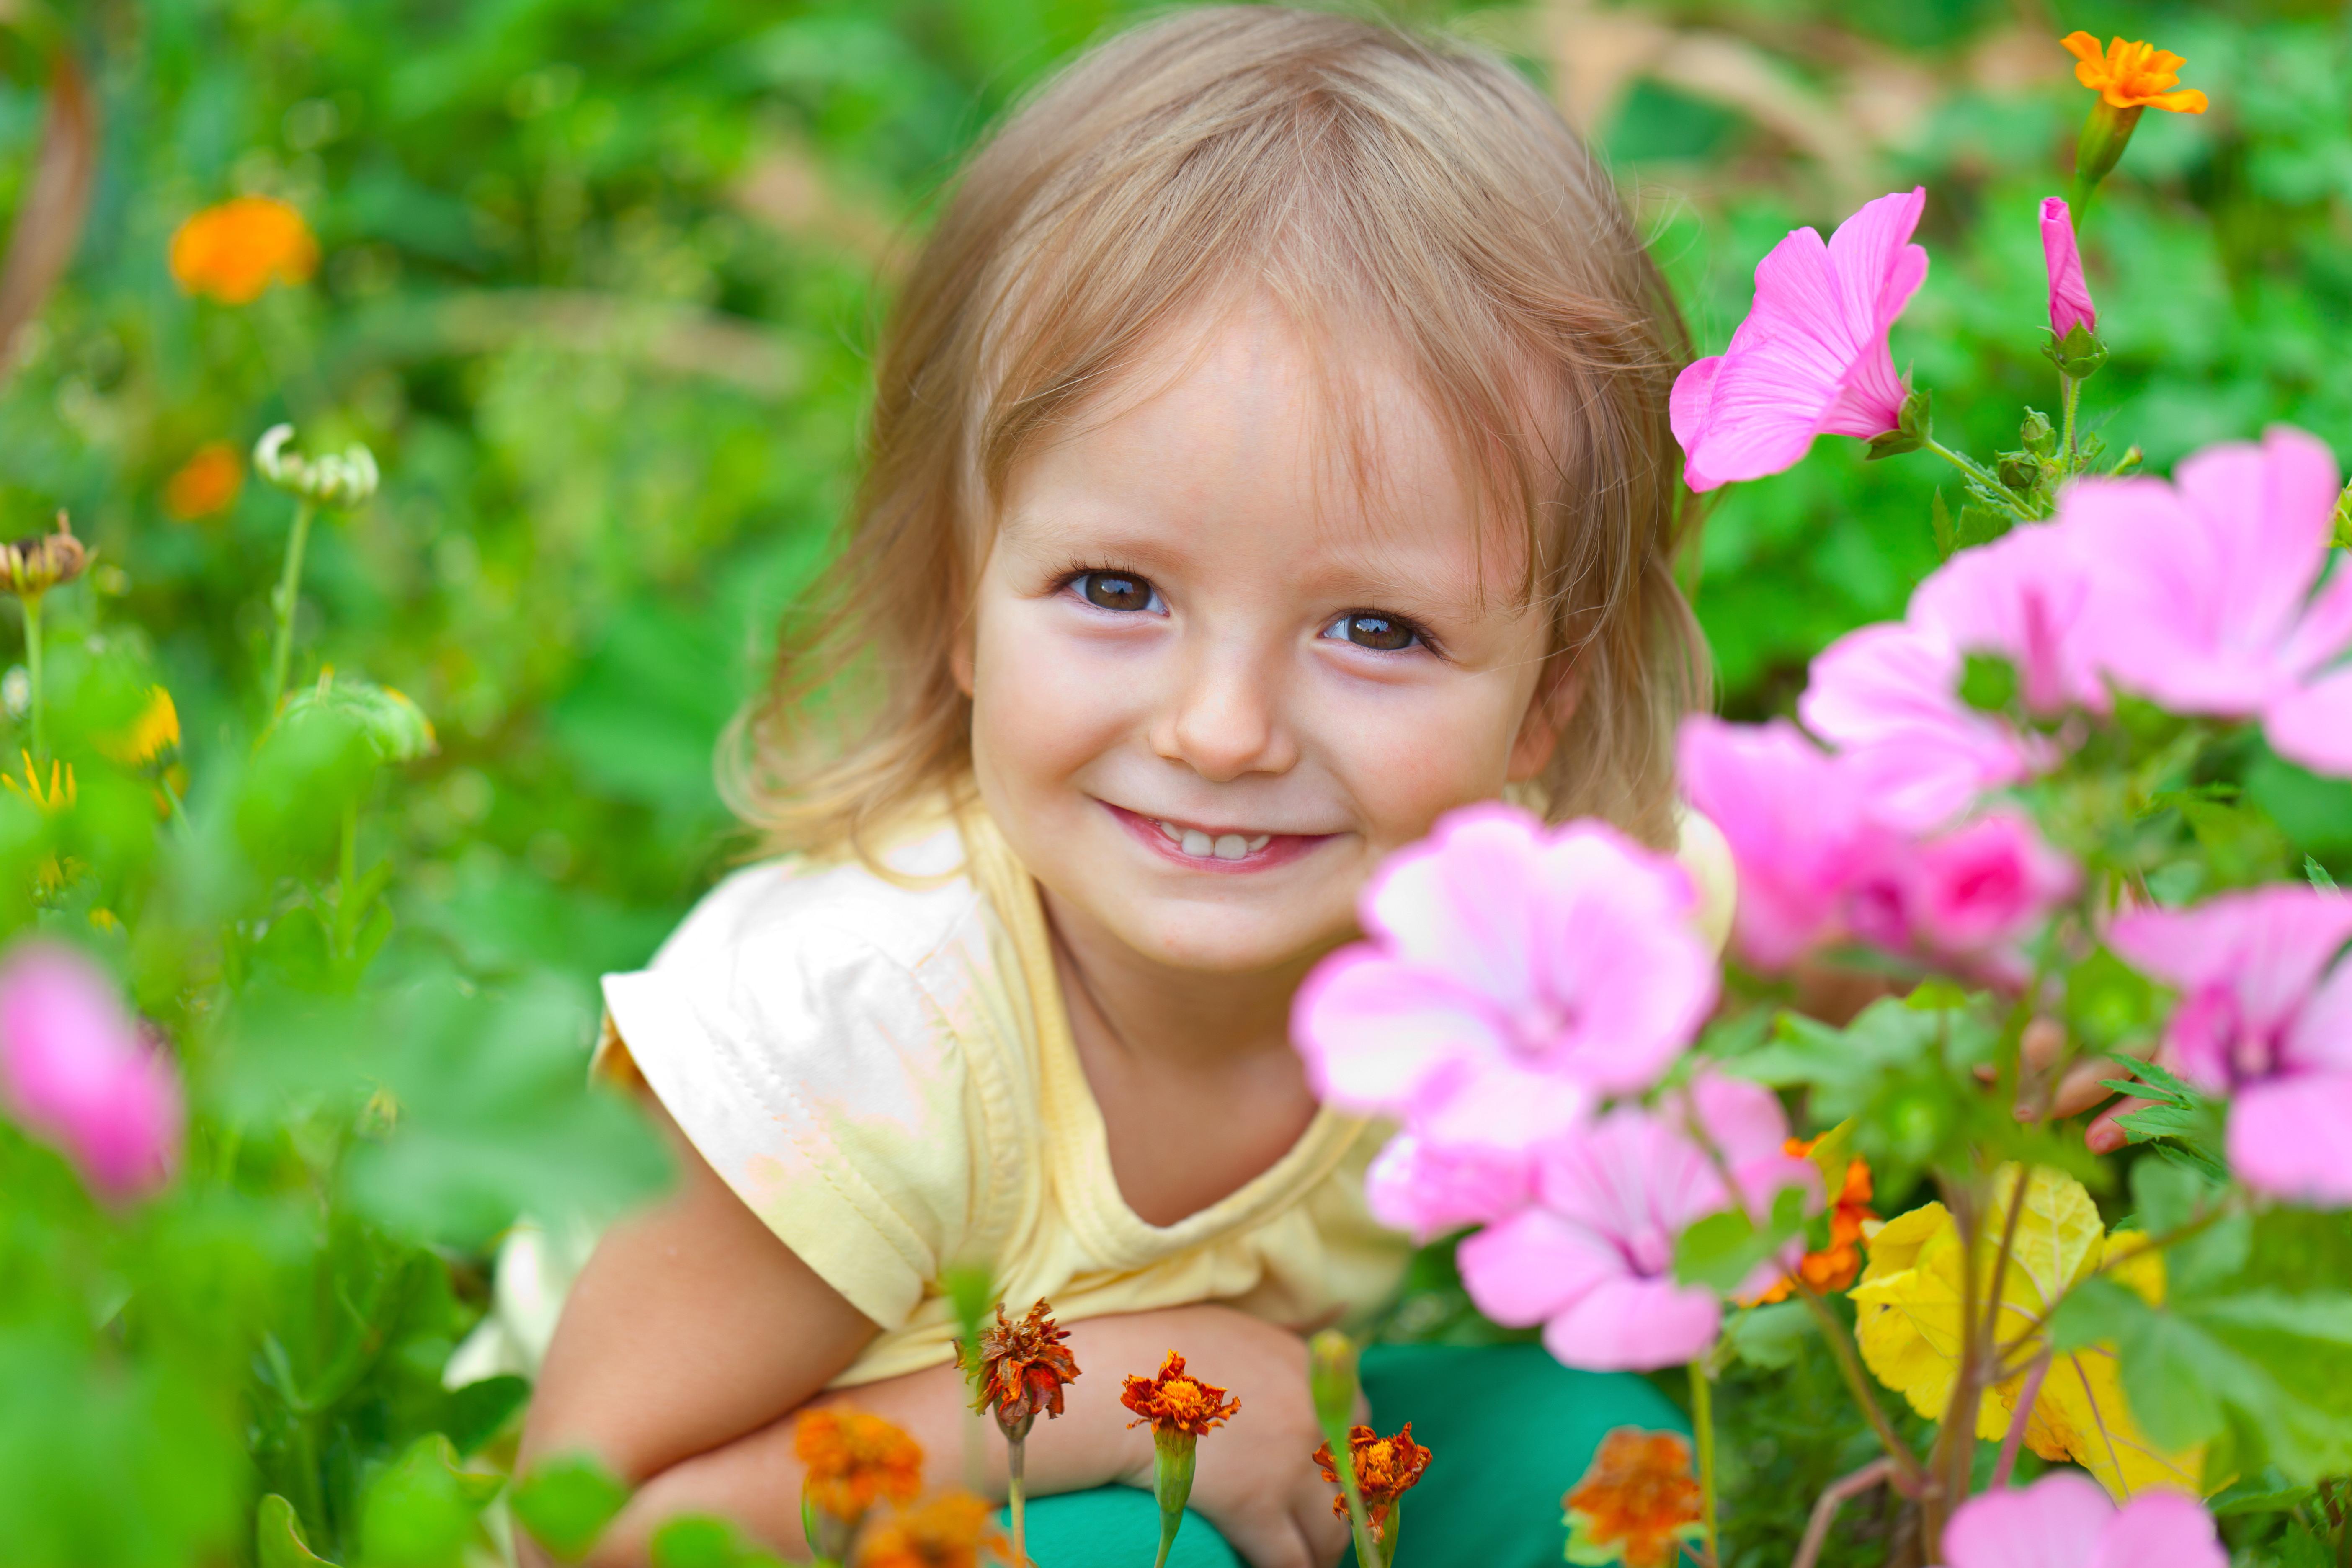 canstockphoto10959521.jpg